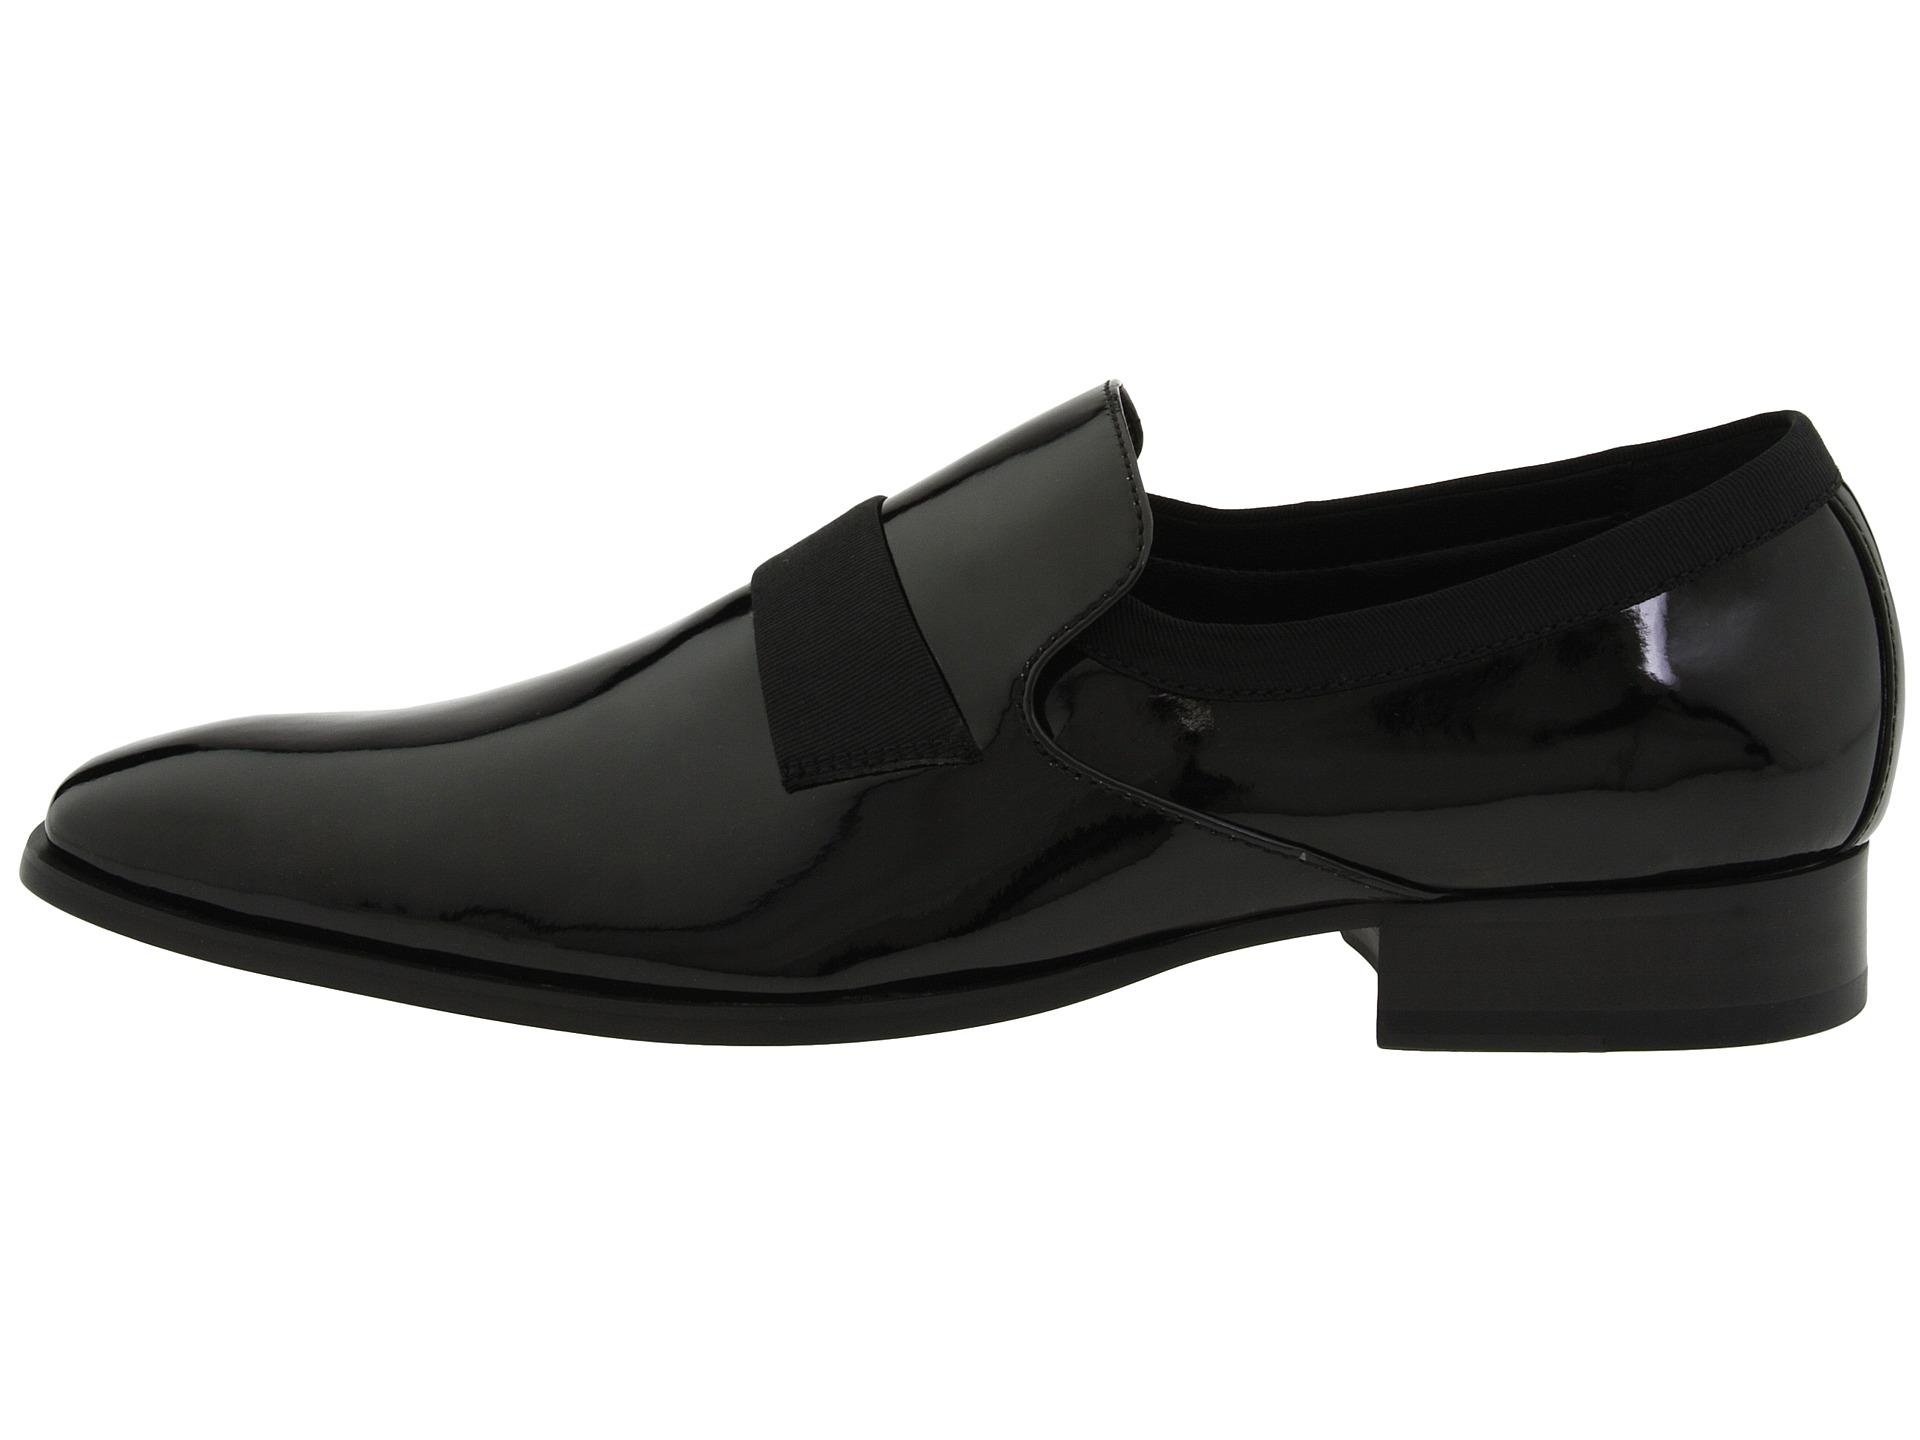 Calvin Klein Brodie Black Tuxedo Shoes - Formal Shoes   Men's